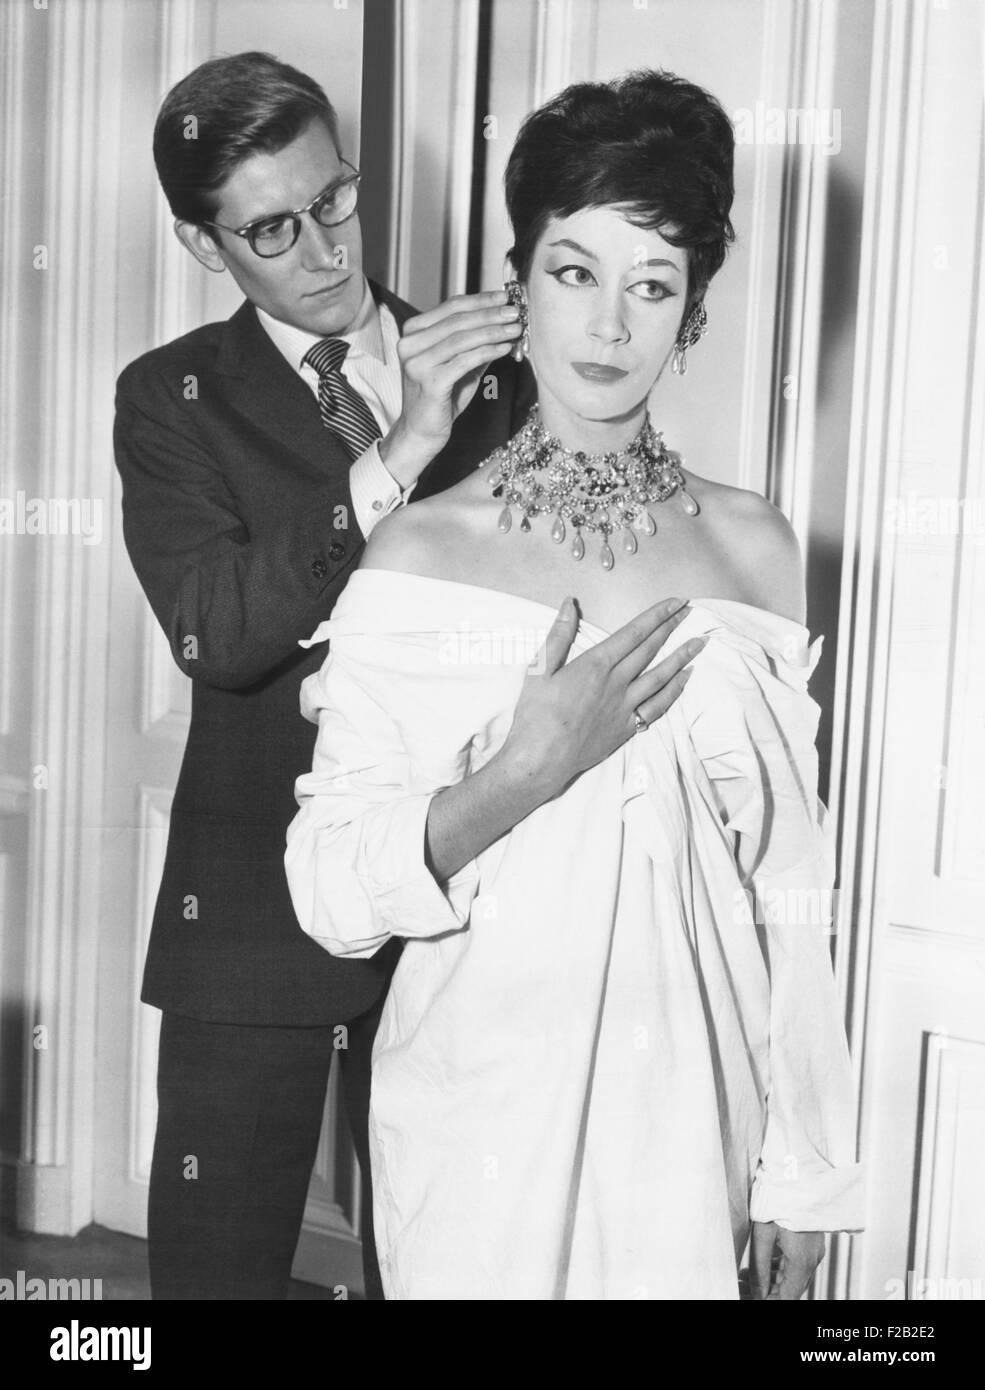 French fashion designer Yves Saint Laurent putting earing on model. Jan. 18, 1962. (CSU_2015_7_380) - Stock Image